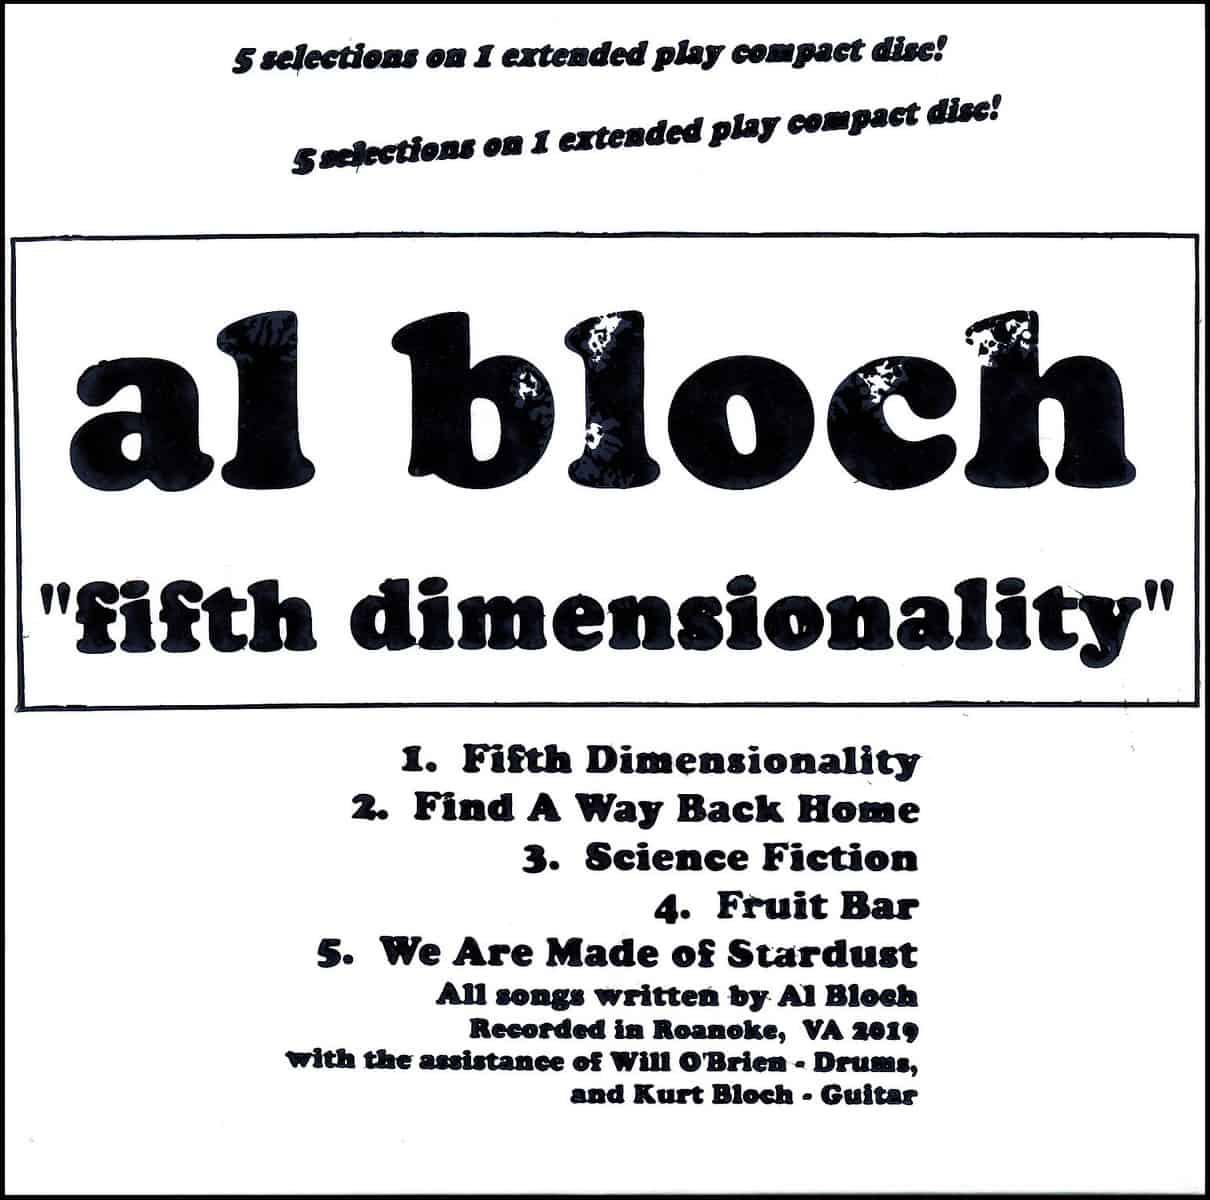 Al Bloch Fifth Dimensionality